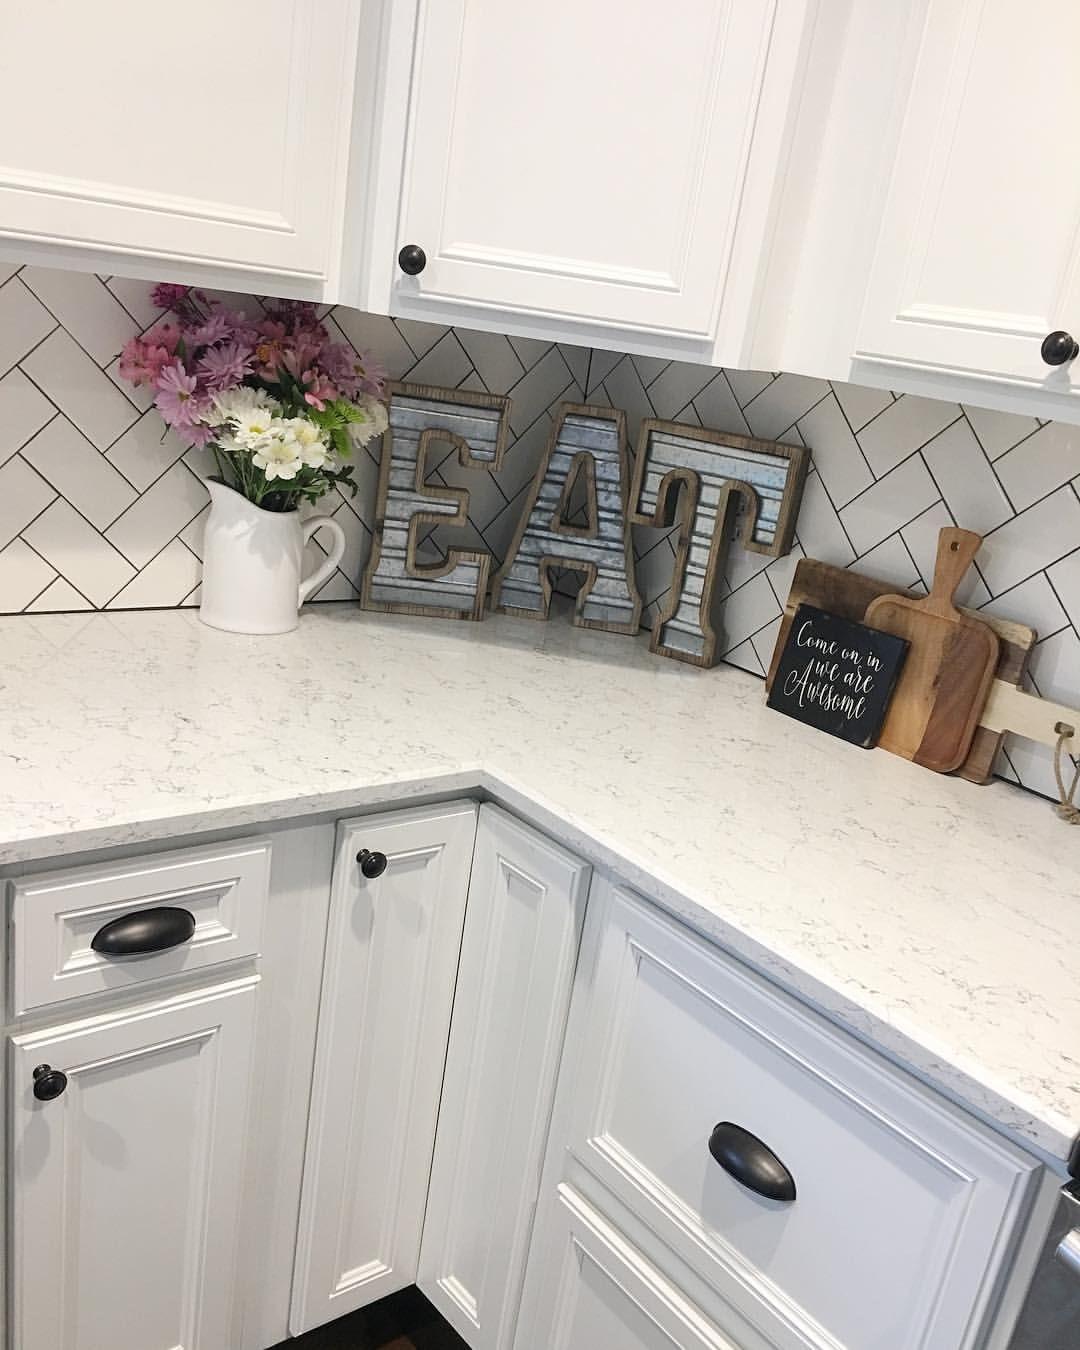 Best 12 Decorative Kitchen Tile Ideas | Hobby lobby decor ...